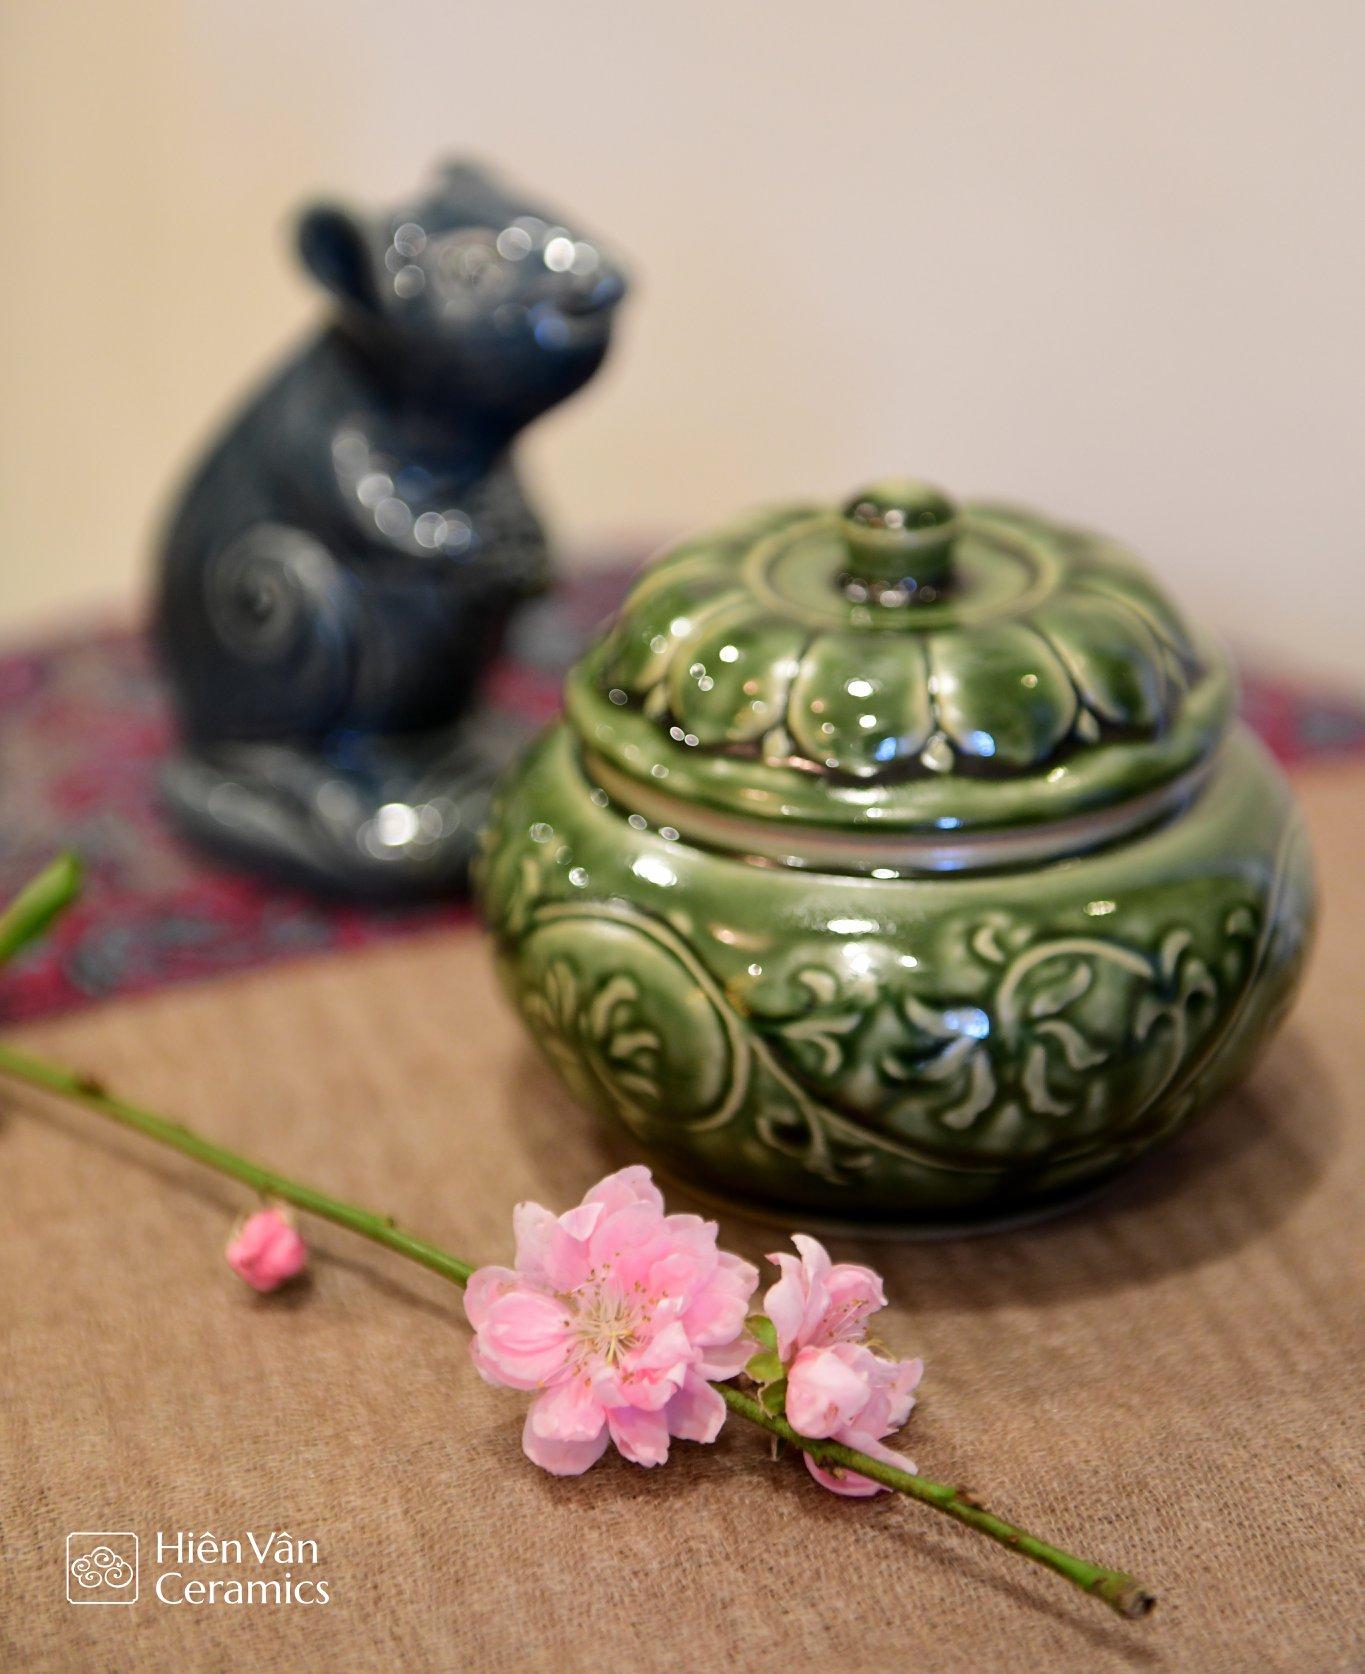 hu-mut-gom-hoa-tiet-hoa-day-hien-van-ceramics-sap-chang-sen